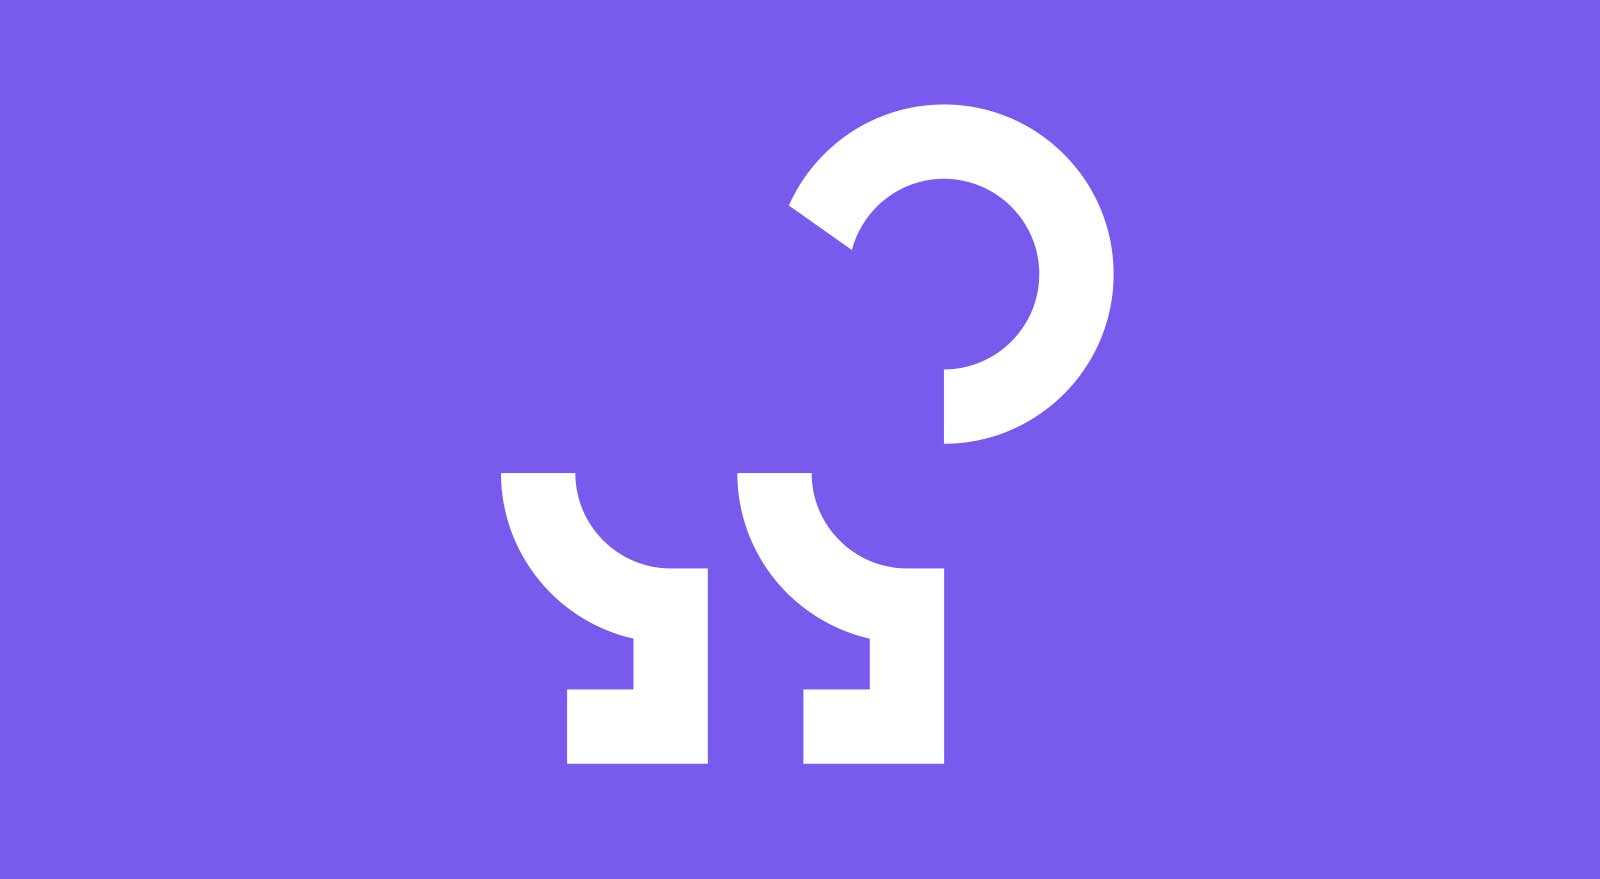 Kat Kan, Identidad corporativa, logotipo, símbolo